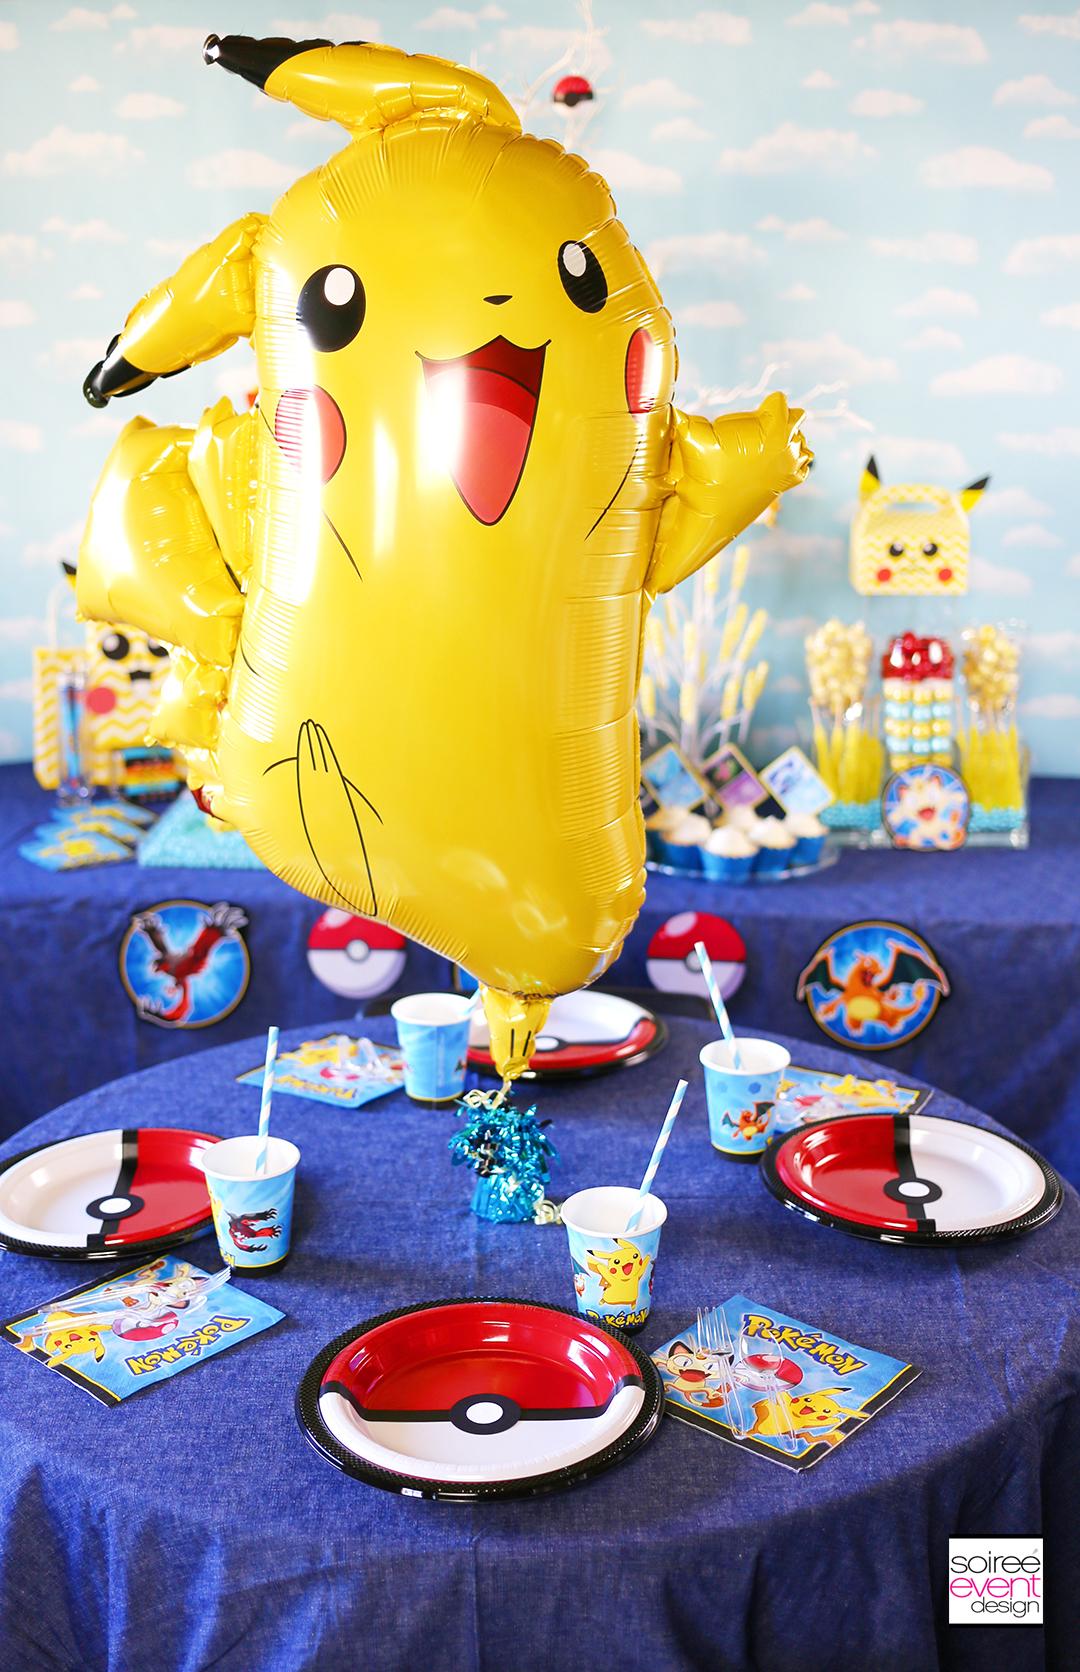 Pokemon Party Ideas - Pokemon Dining Table